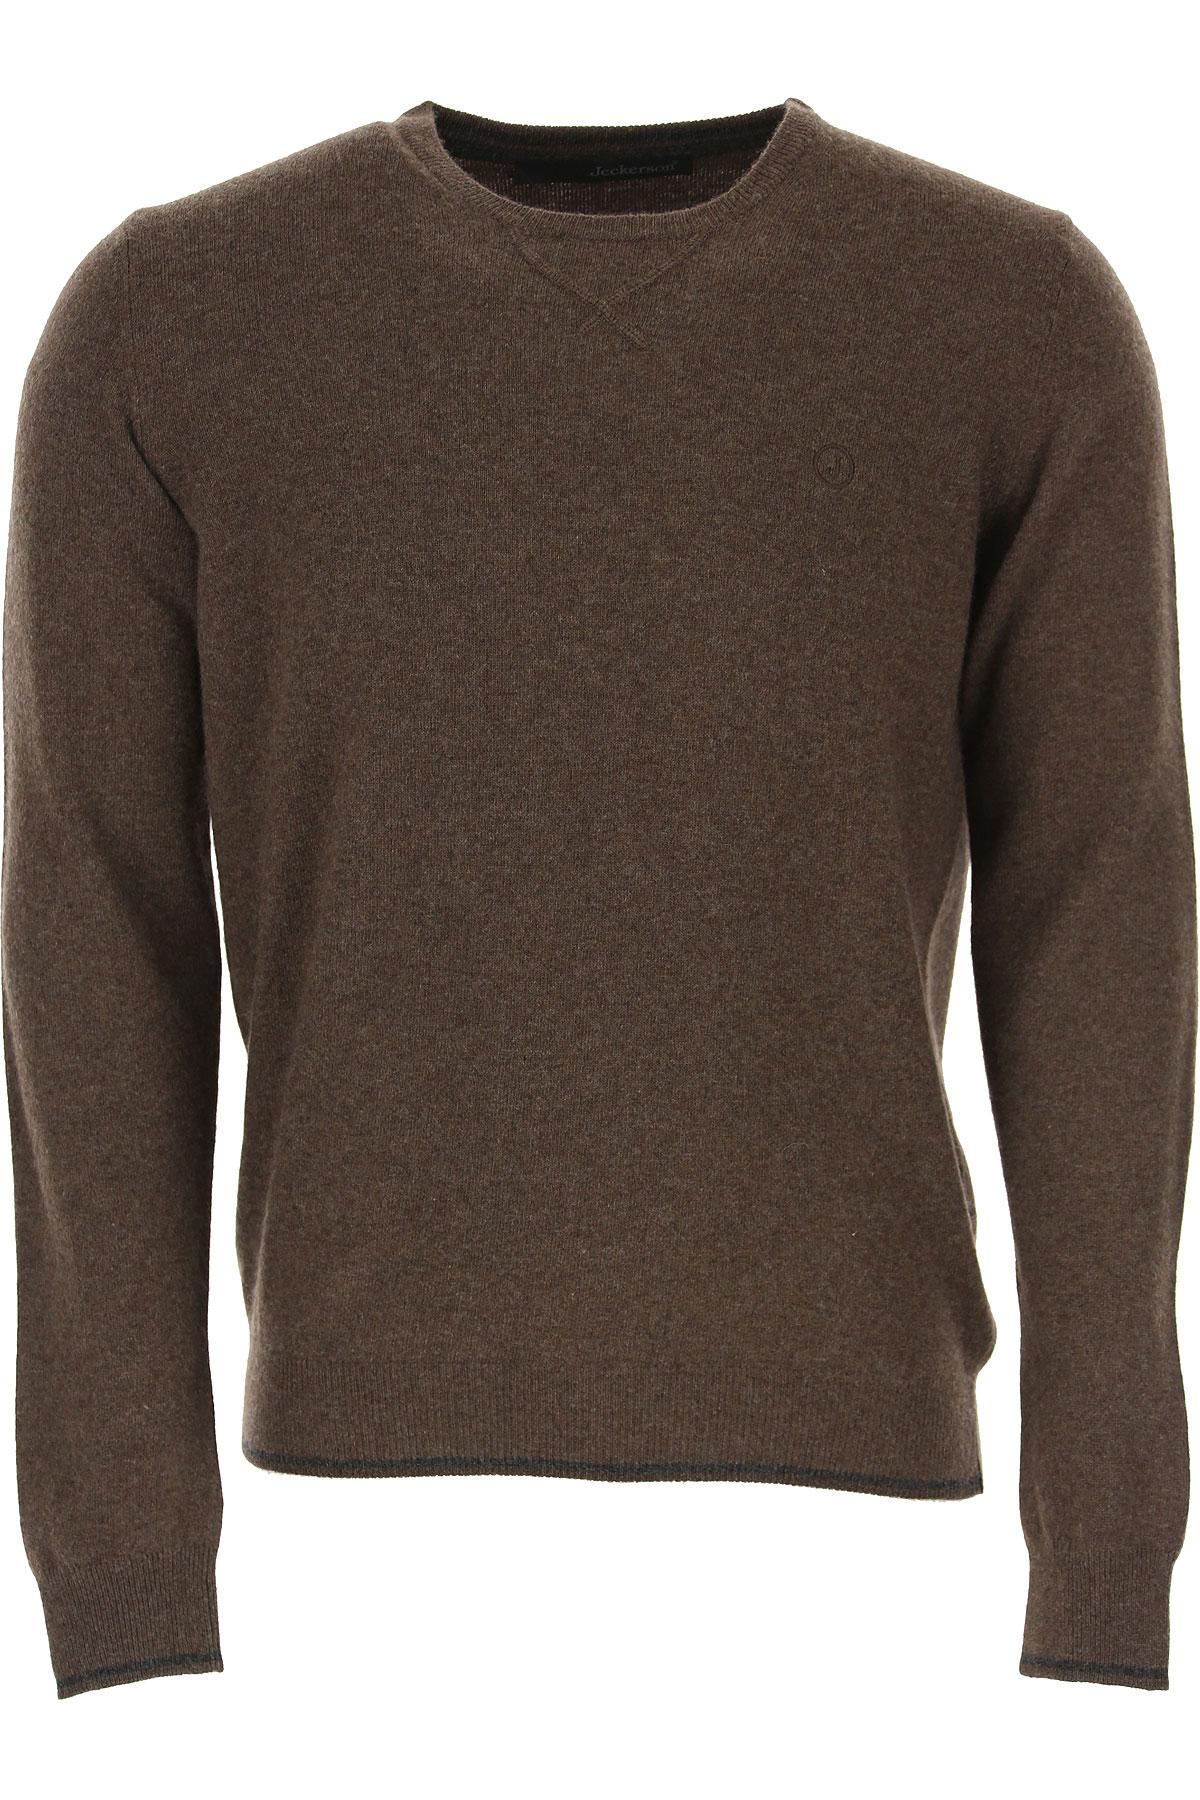 Jeckerson Sweater for Men Jumper, Brown, polyamide, 2019, L S XXL